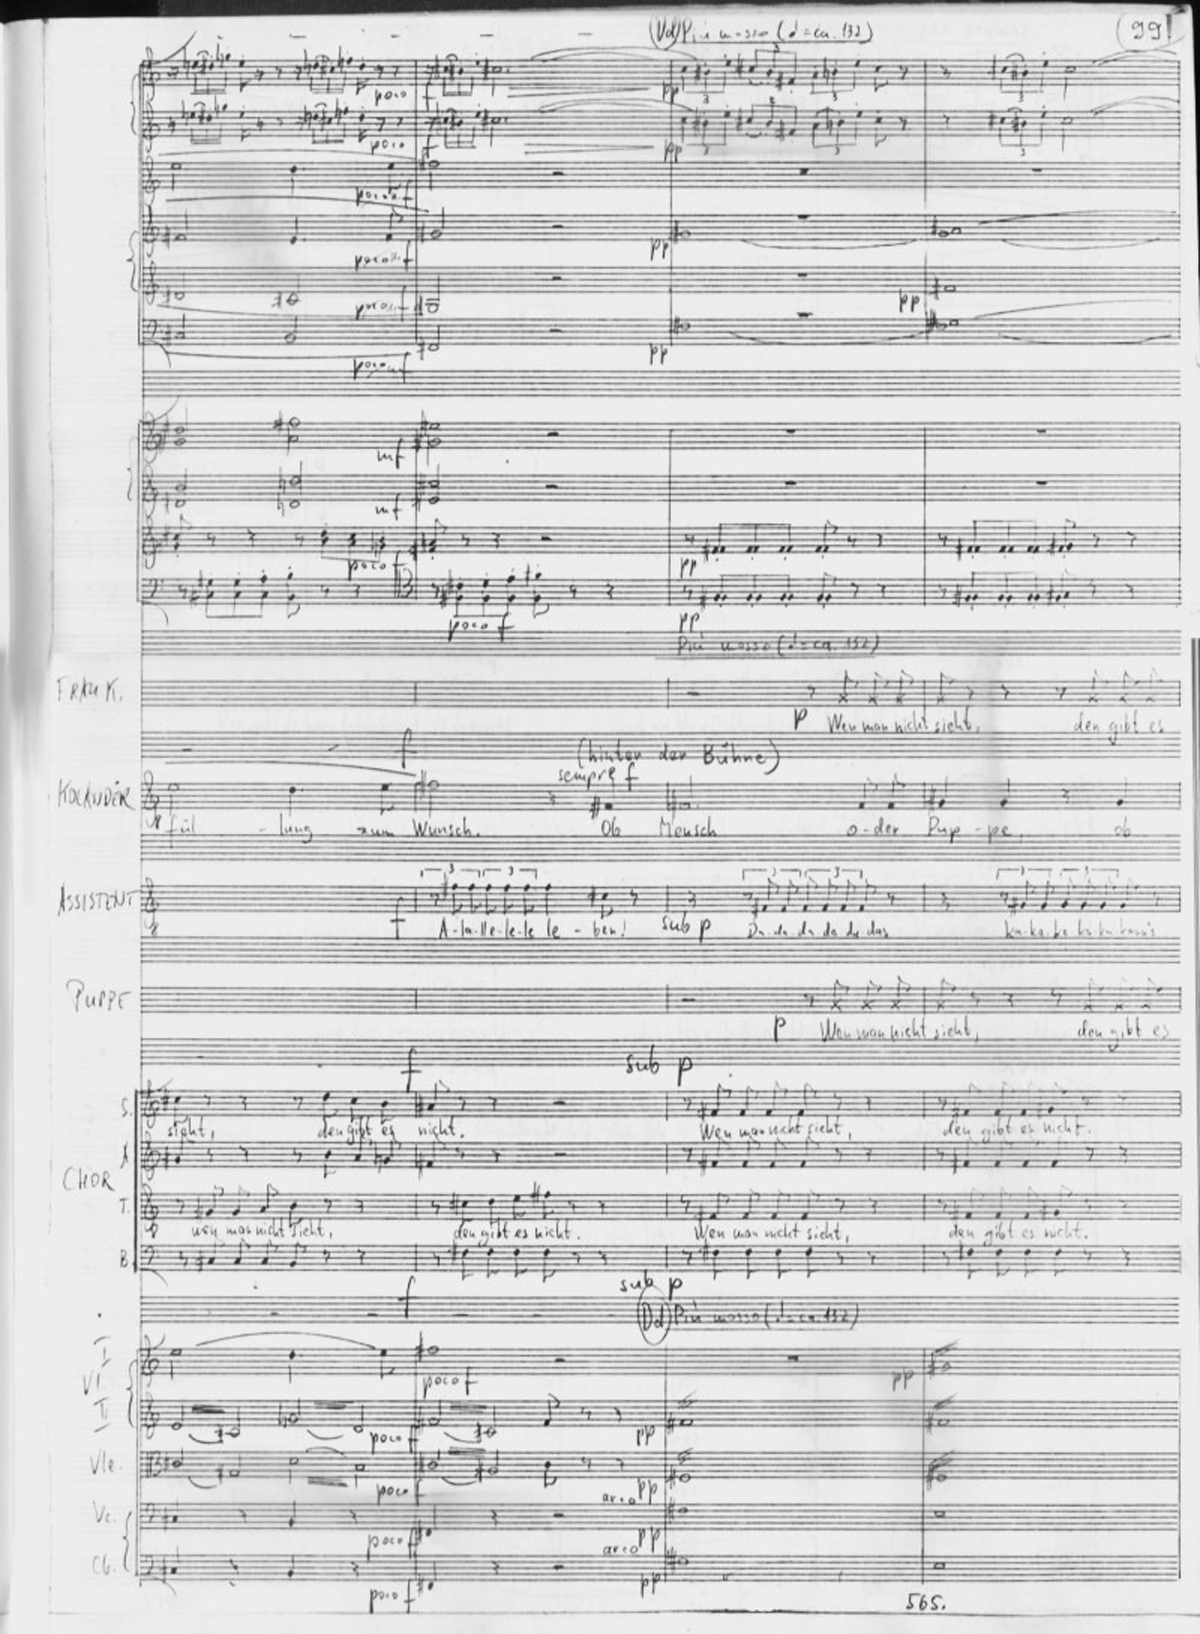 Ivan Eröd, Manuskript - Orpheus ex machina Op. 25 / © Iván Eröd